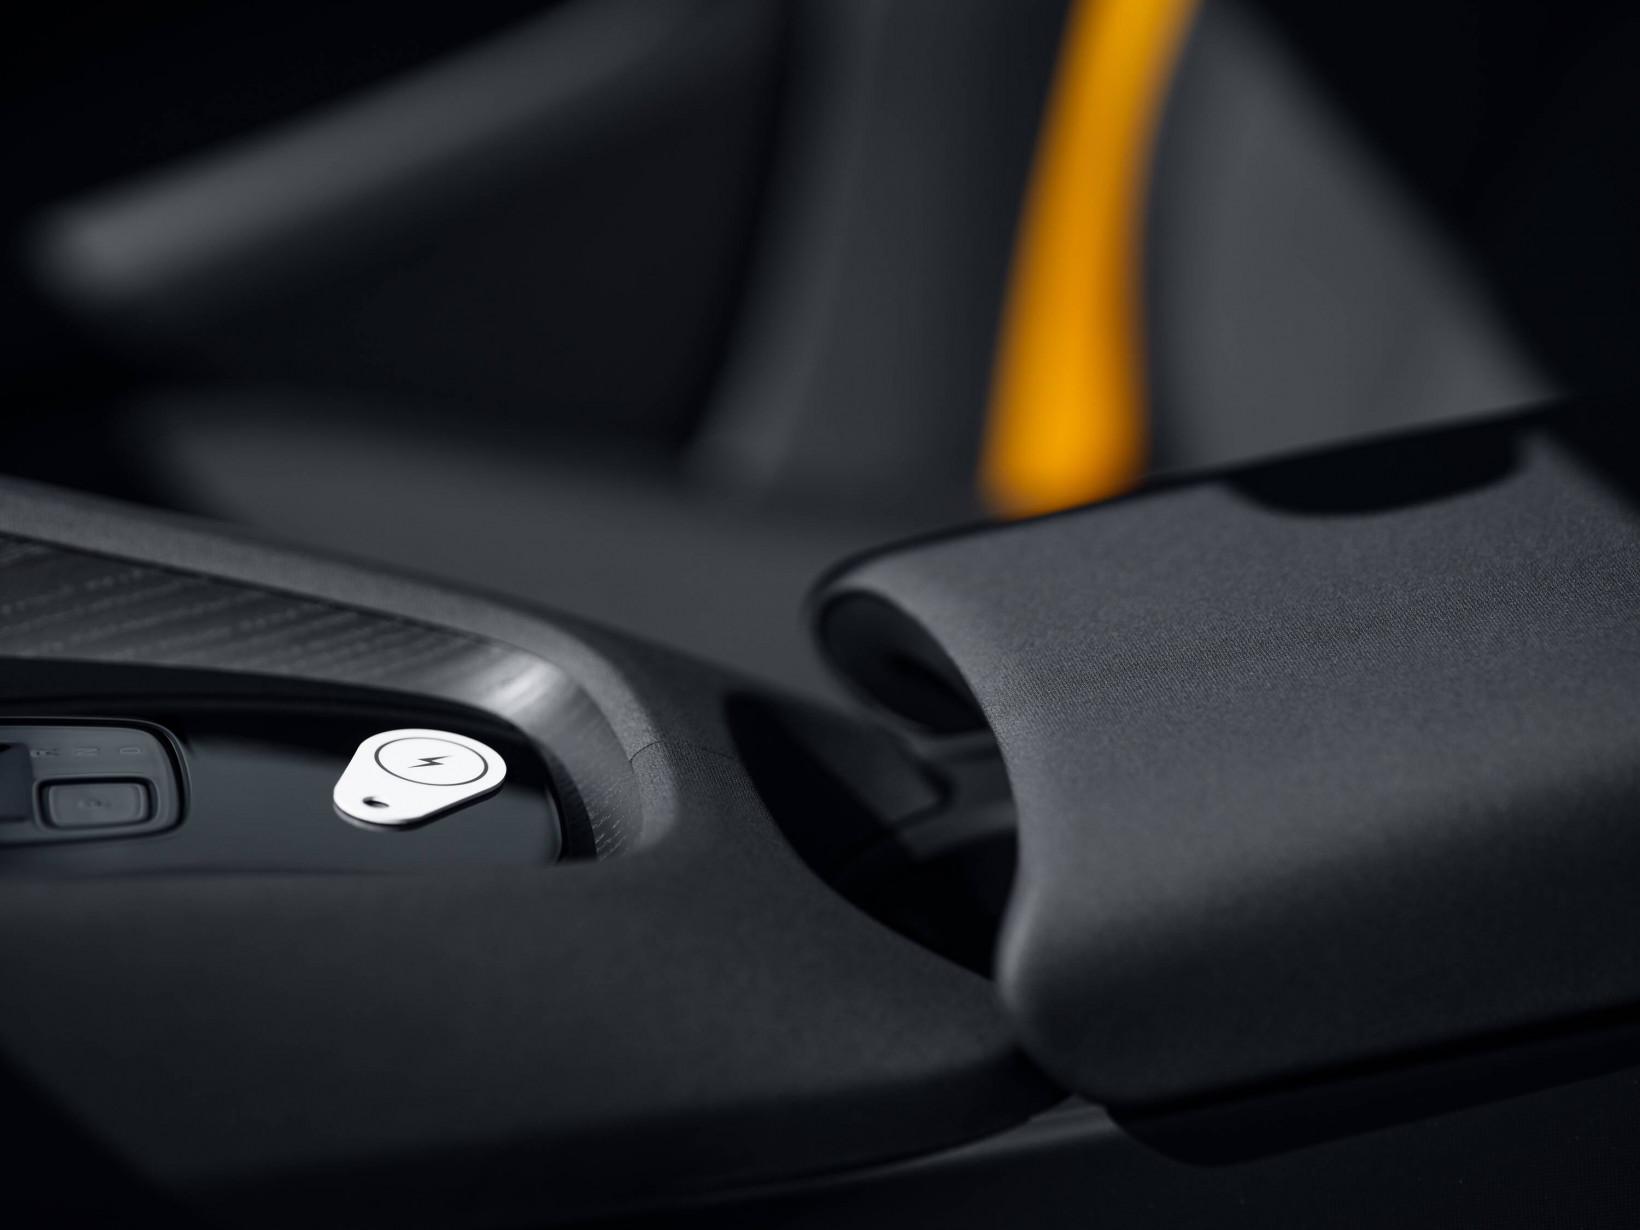 Polestar 2, vehicles, cars, plugsurfing, charging, network